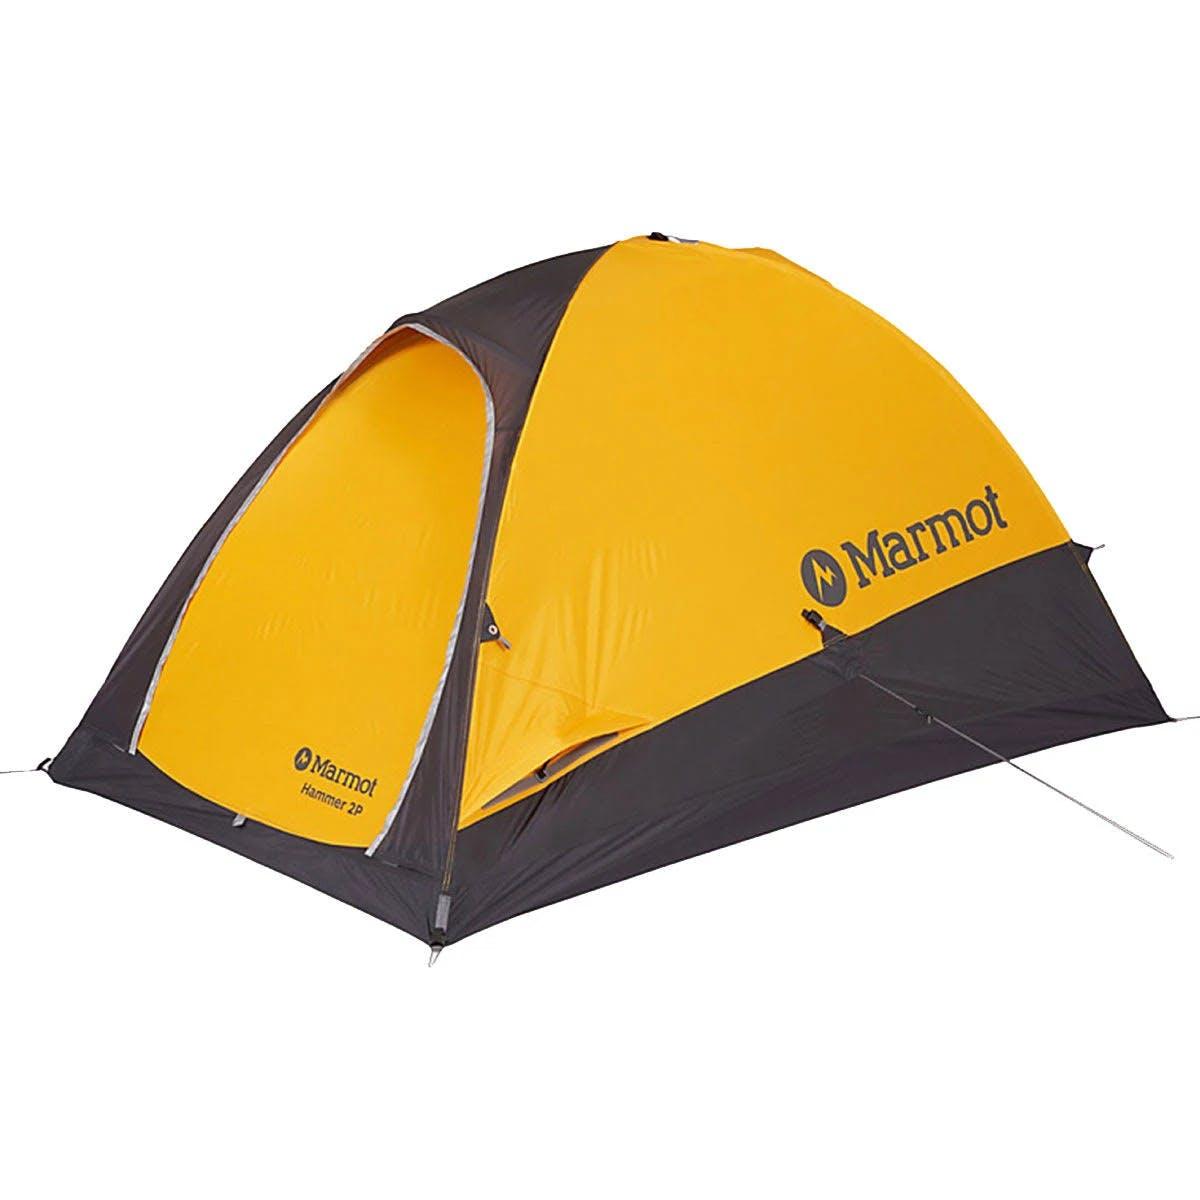 Marmot Hammer 2p Tent - 2 Person / Solar/Steel